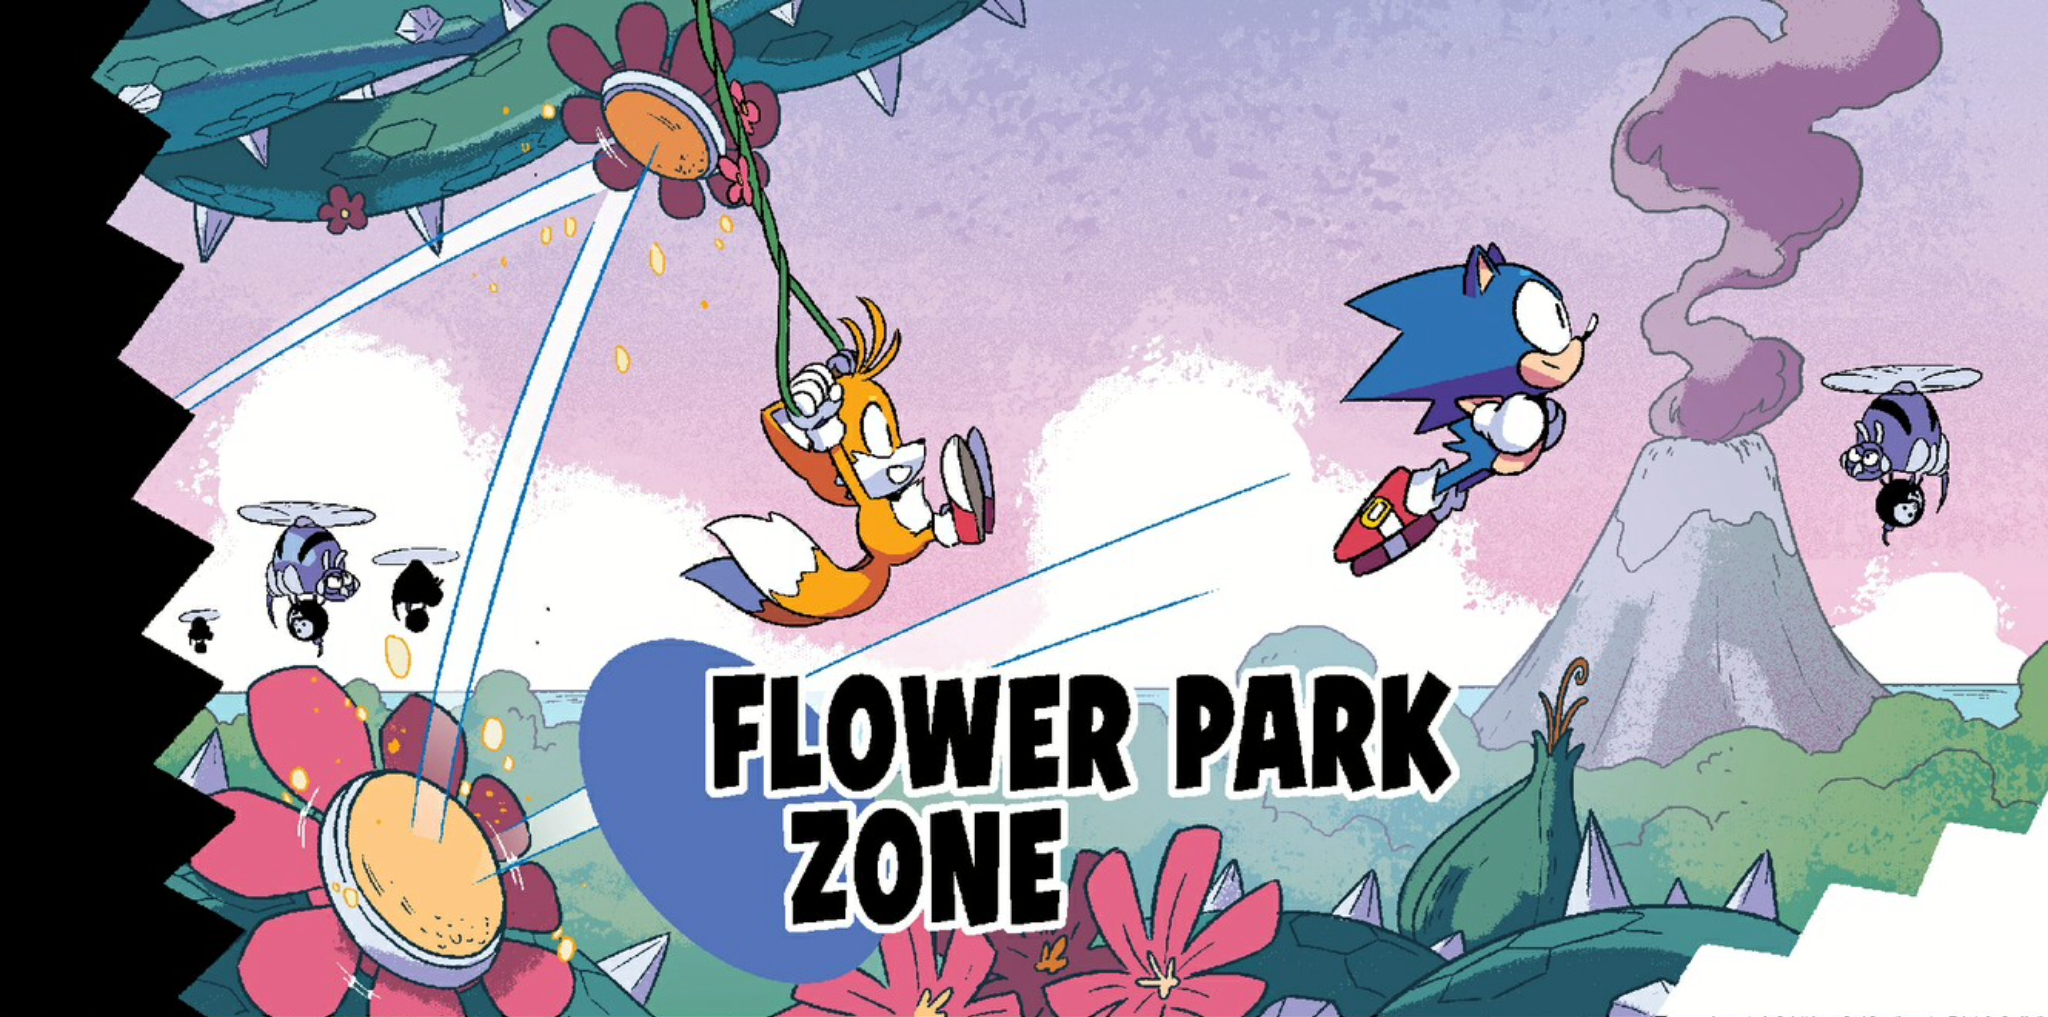 Flower Park Zone